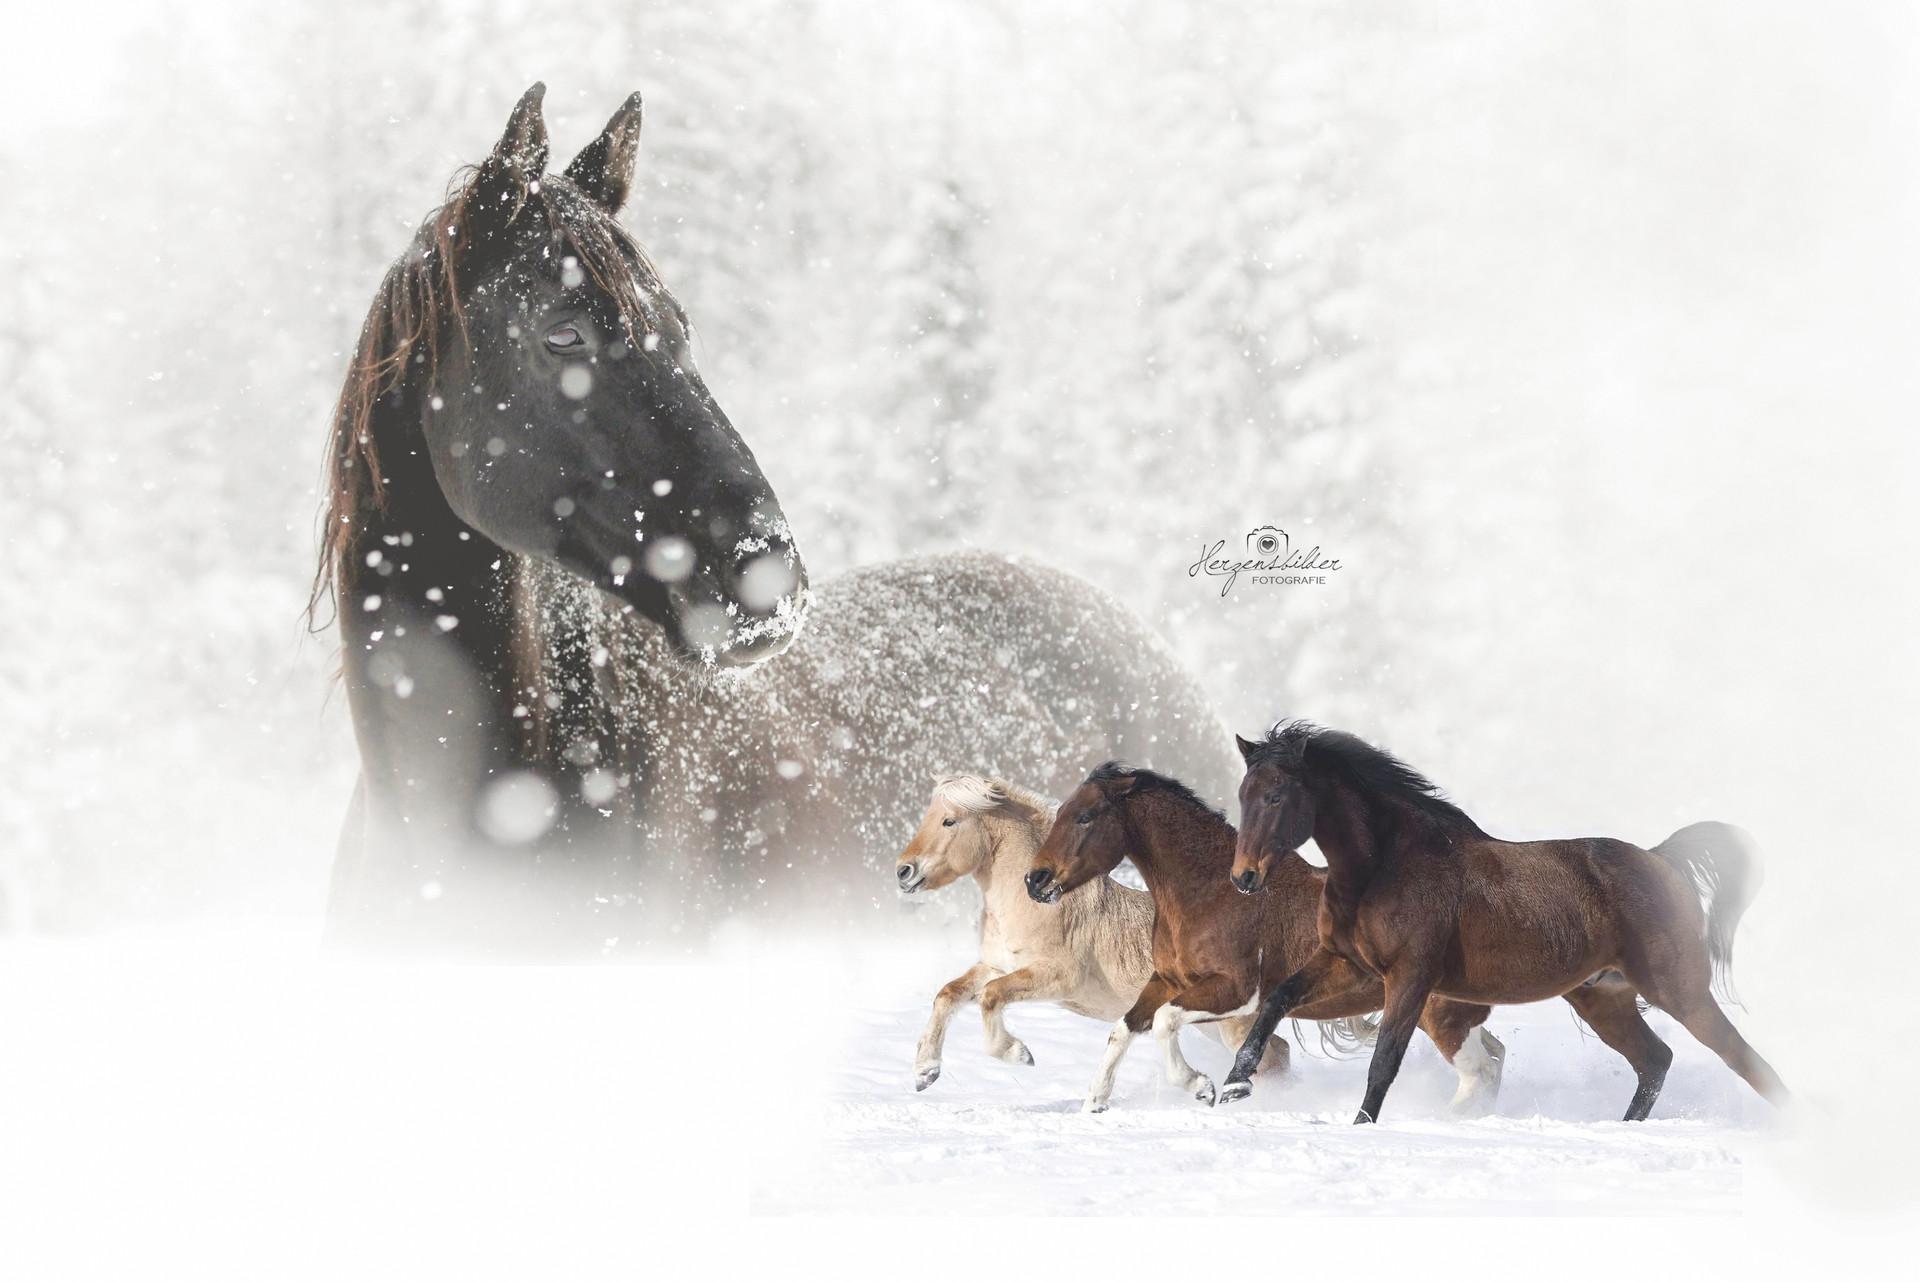 Pferde Wildpferde Hengst Schnee reiten Halle Fotos Pferd SeaHorse Ranch